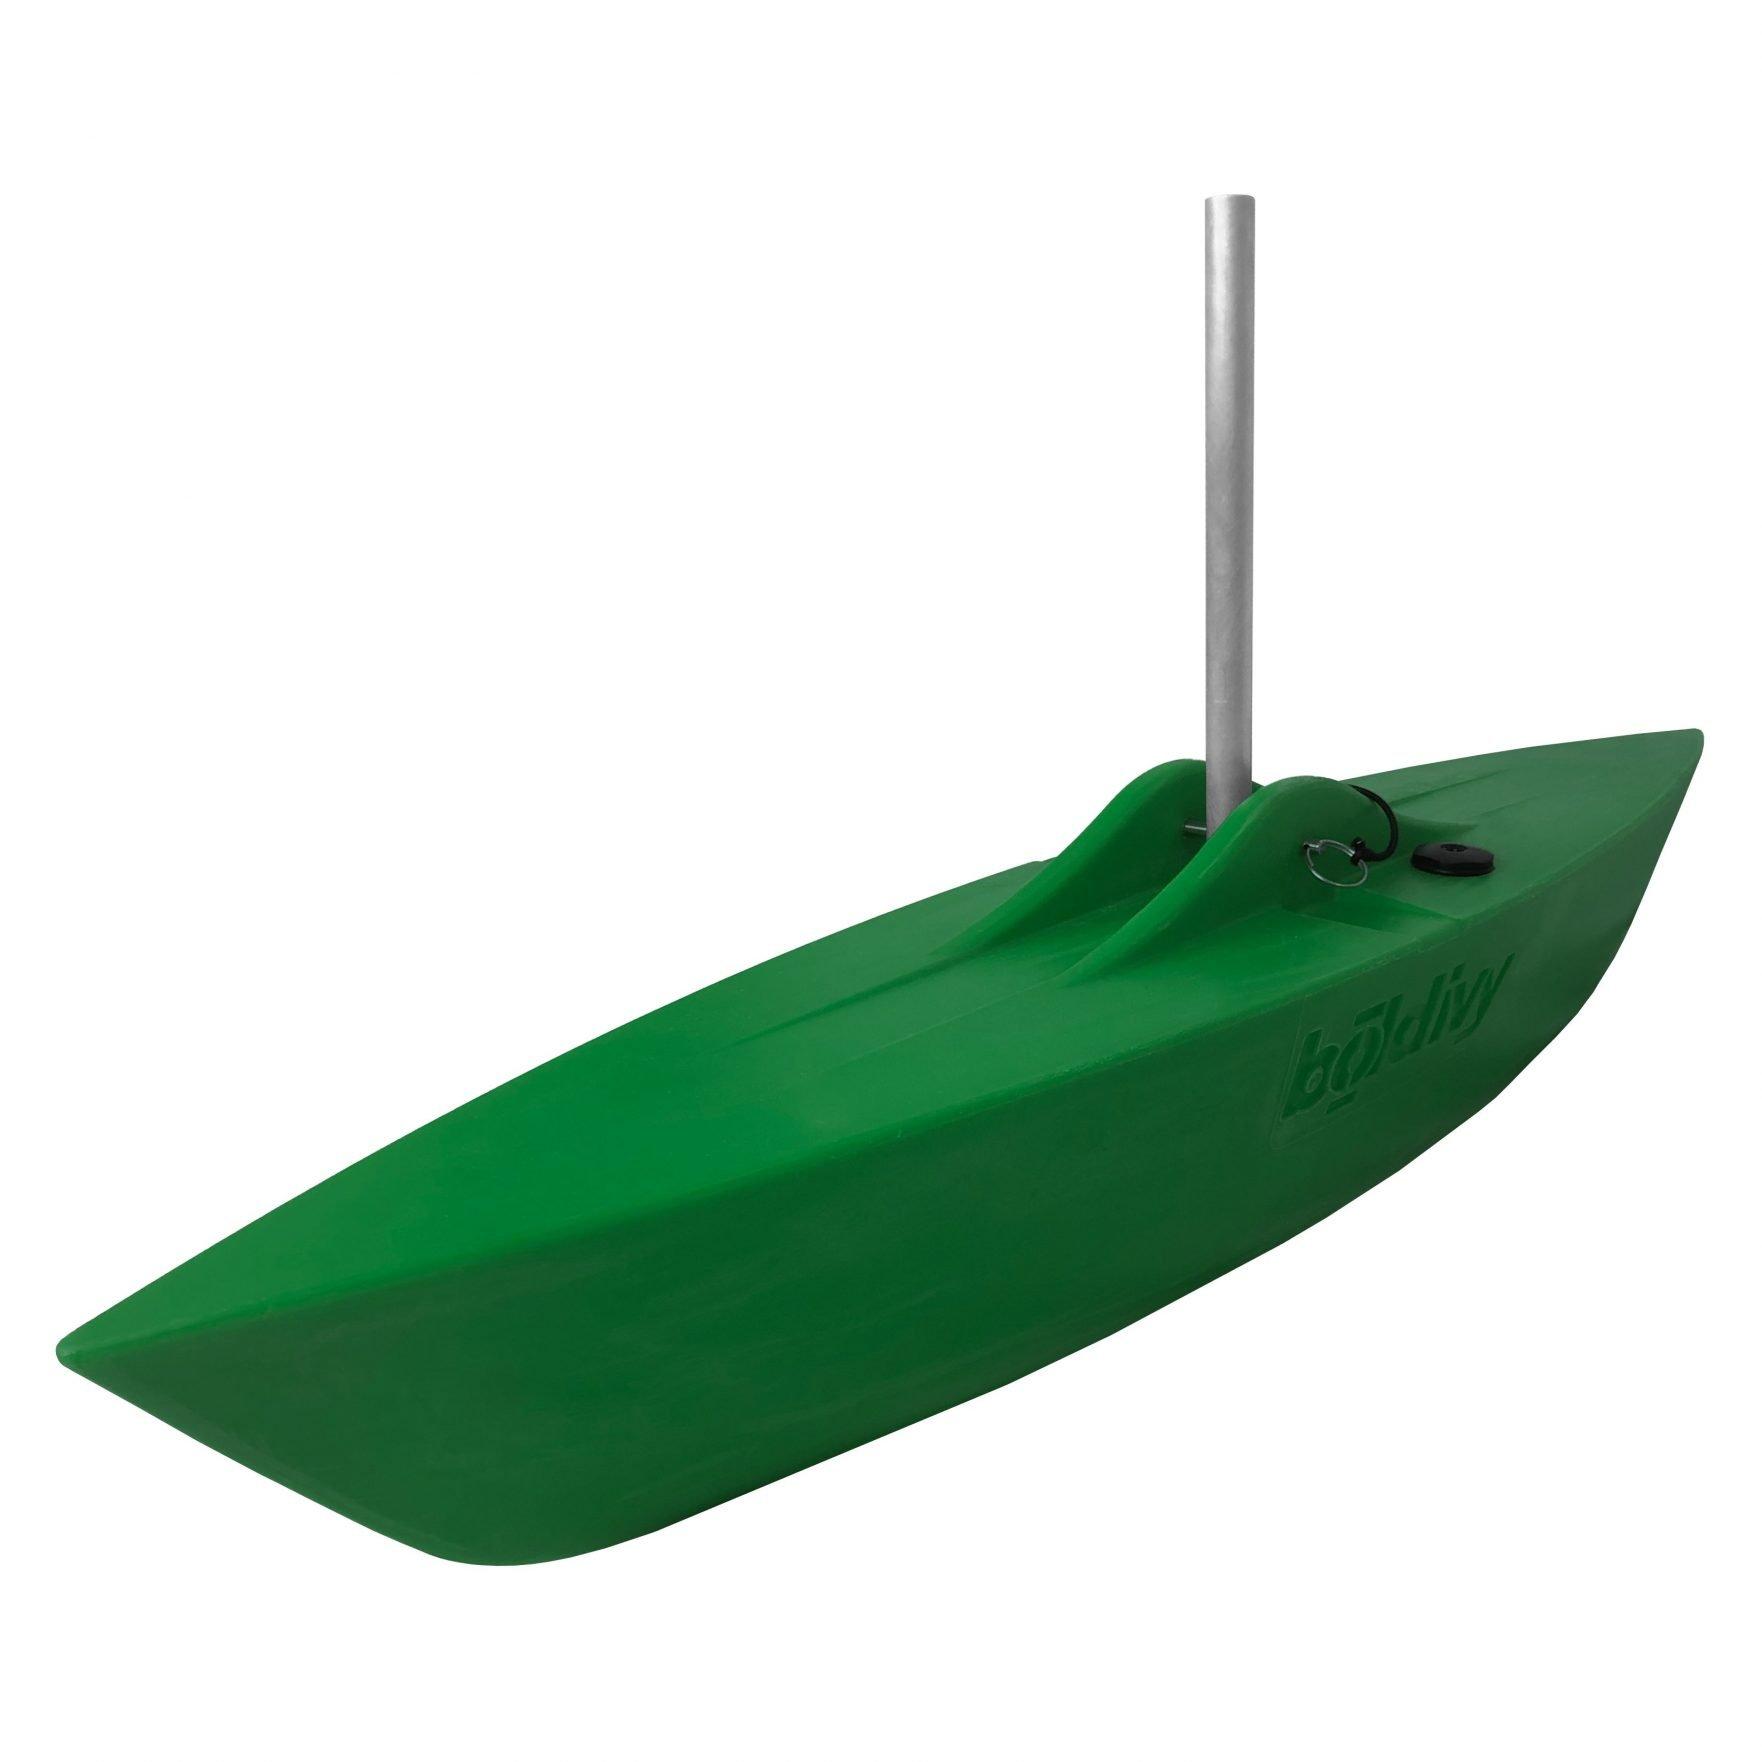 Bold Ivy Canoe Stabilizer Floats - Angle - Green